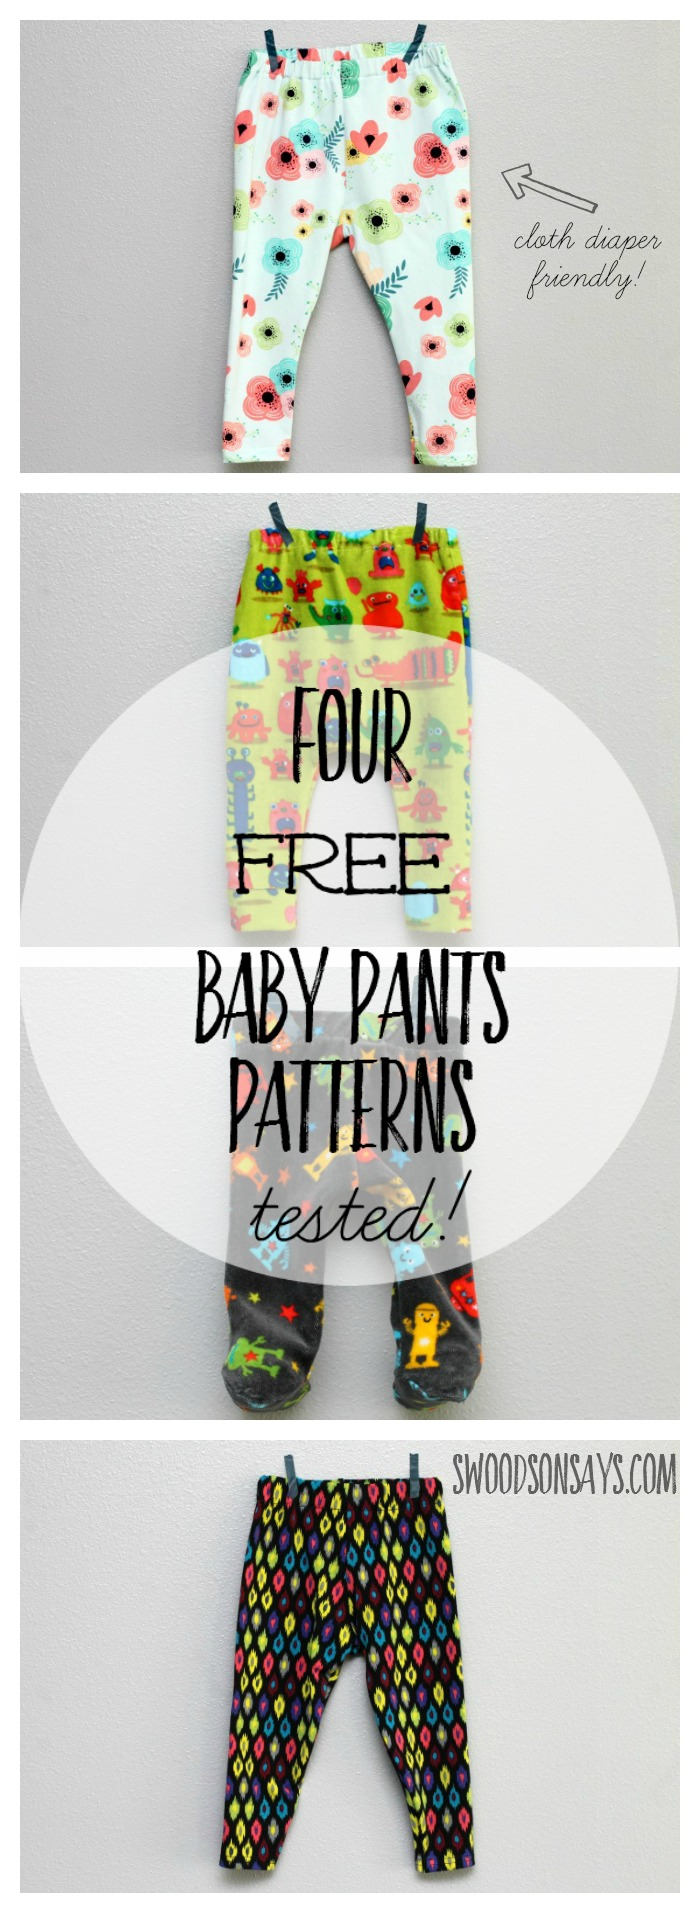 4 free baby pants sewing patterns tested 4 free baby pants sewing patterns all sewn up and tested on swoodsonsays jeuxipadfo Gallery